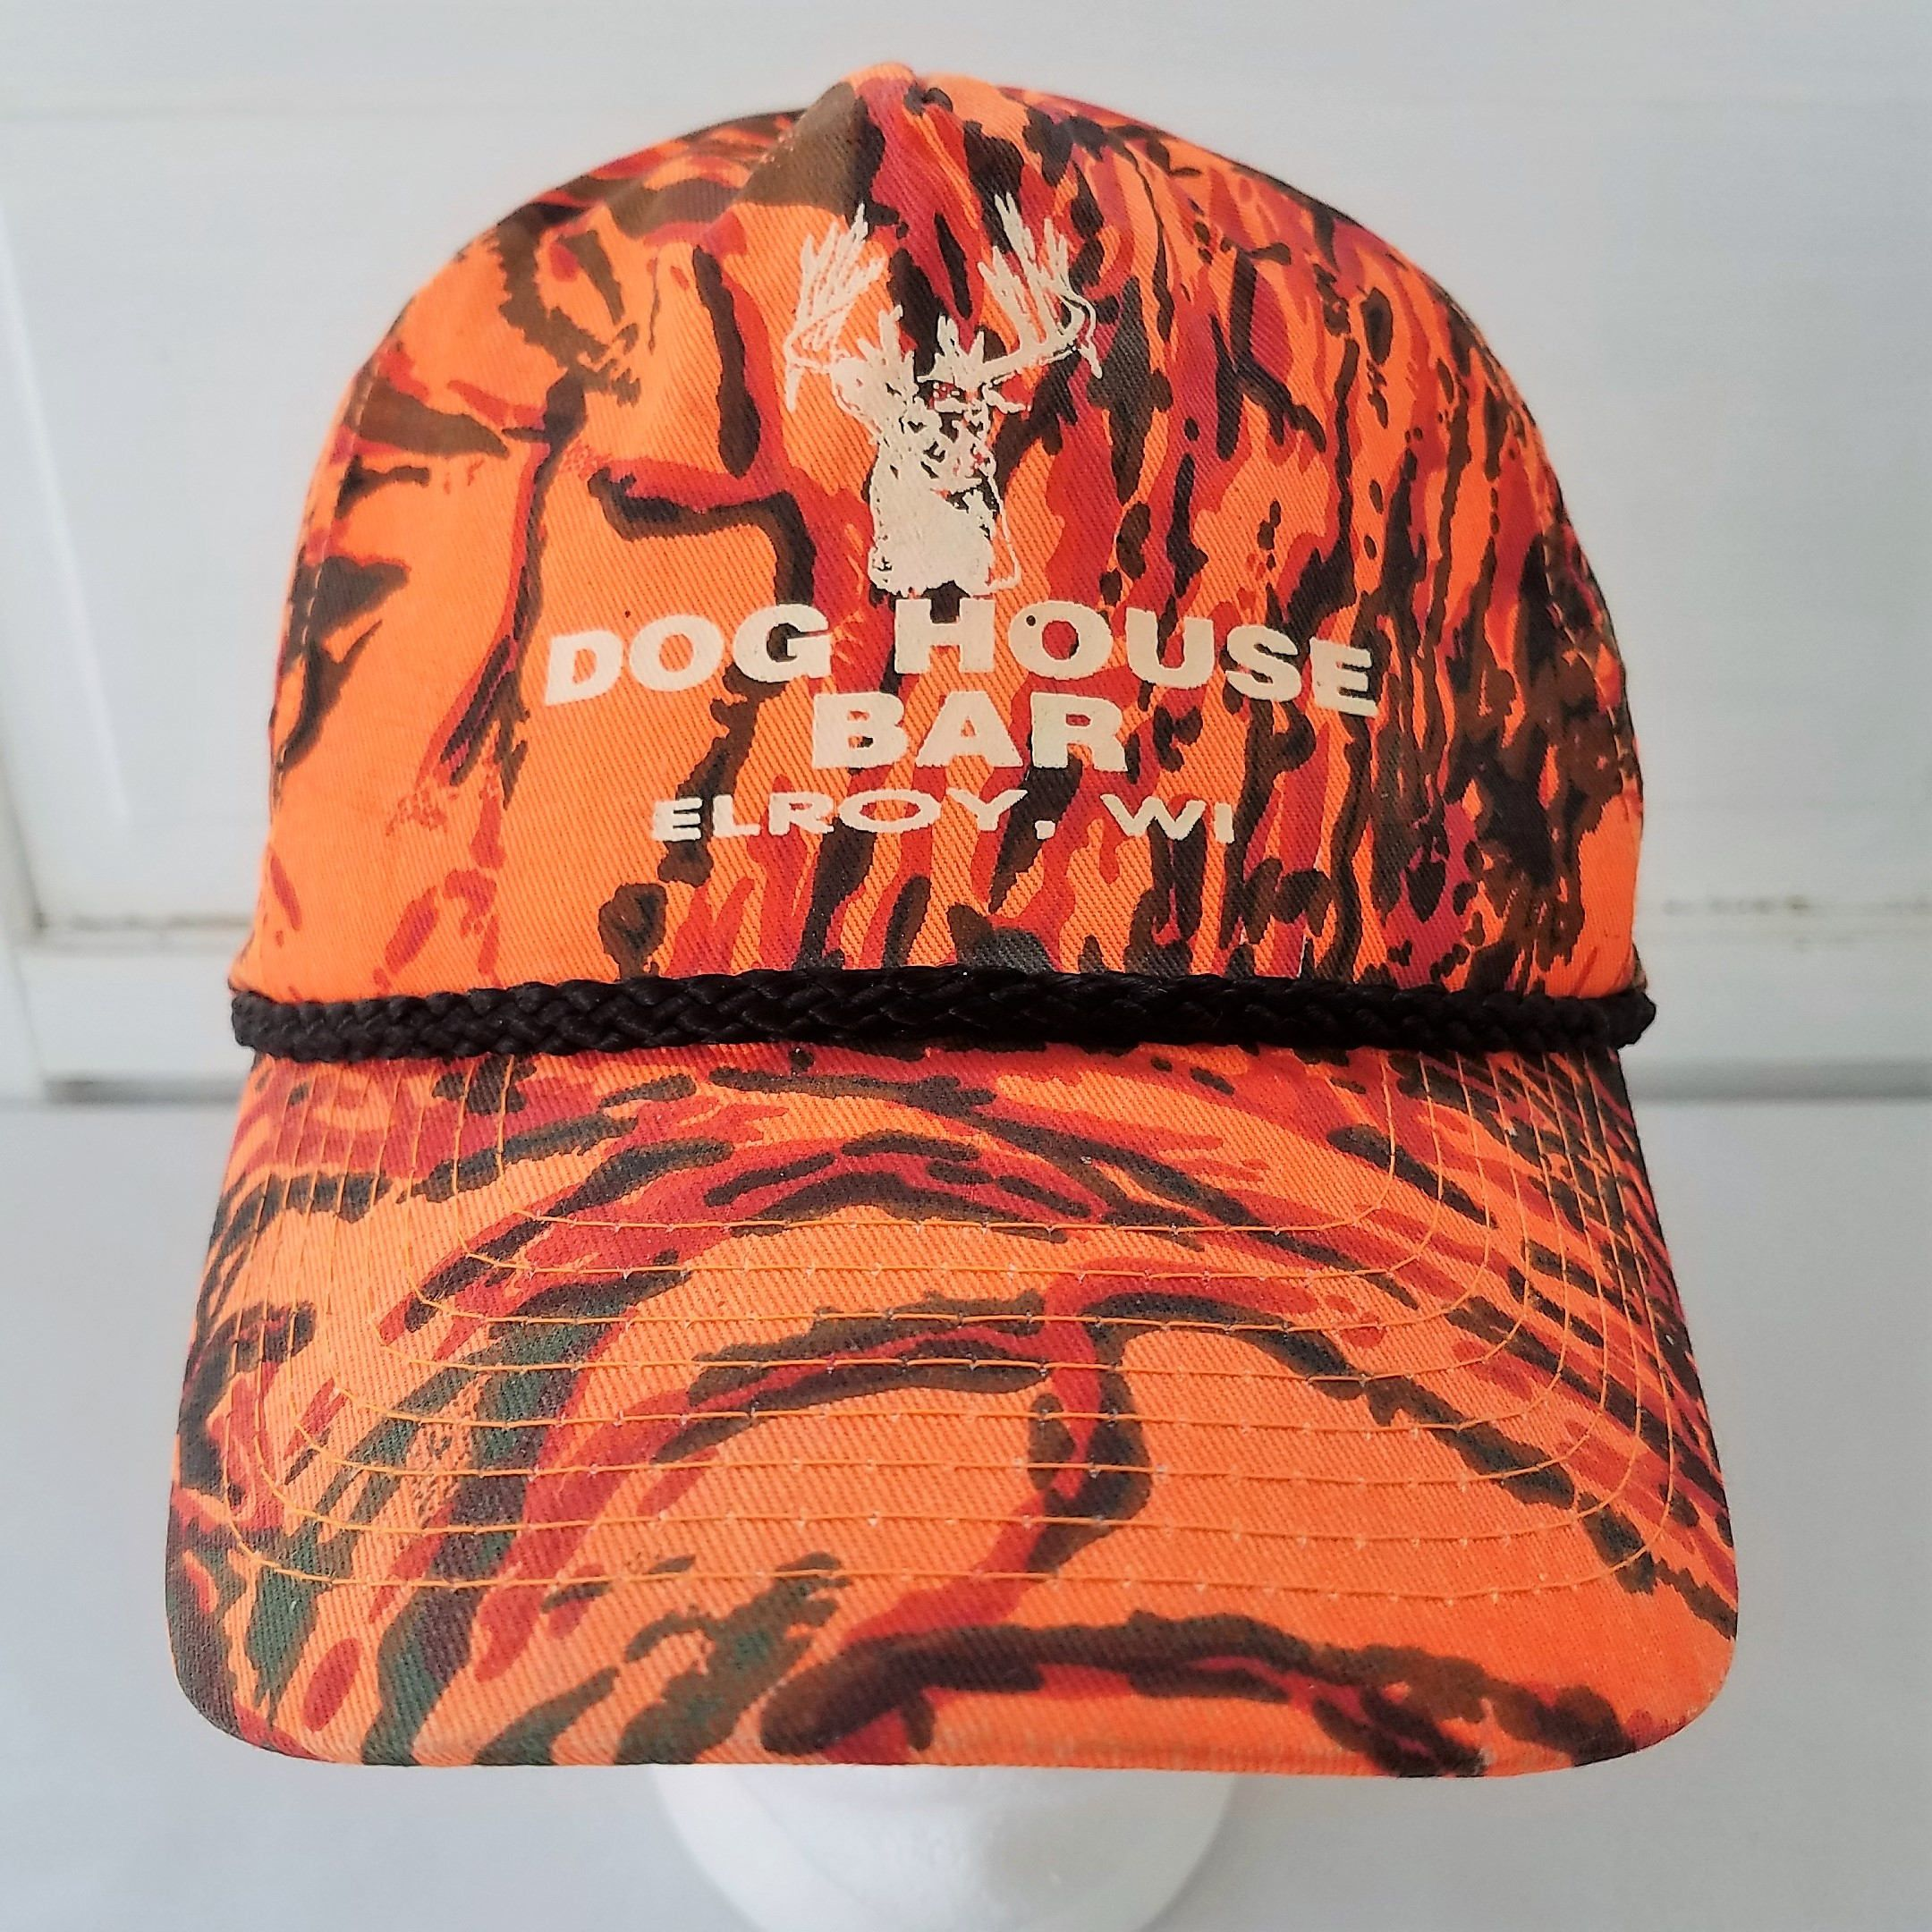 dc2349c8df432b Dog House Bar Snapback Hat Cap Camo Blaze Orange Deer Hunt Elroy WI Hunting  Up North